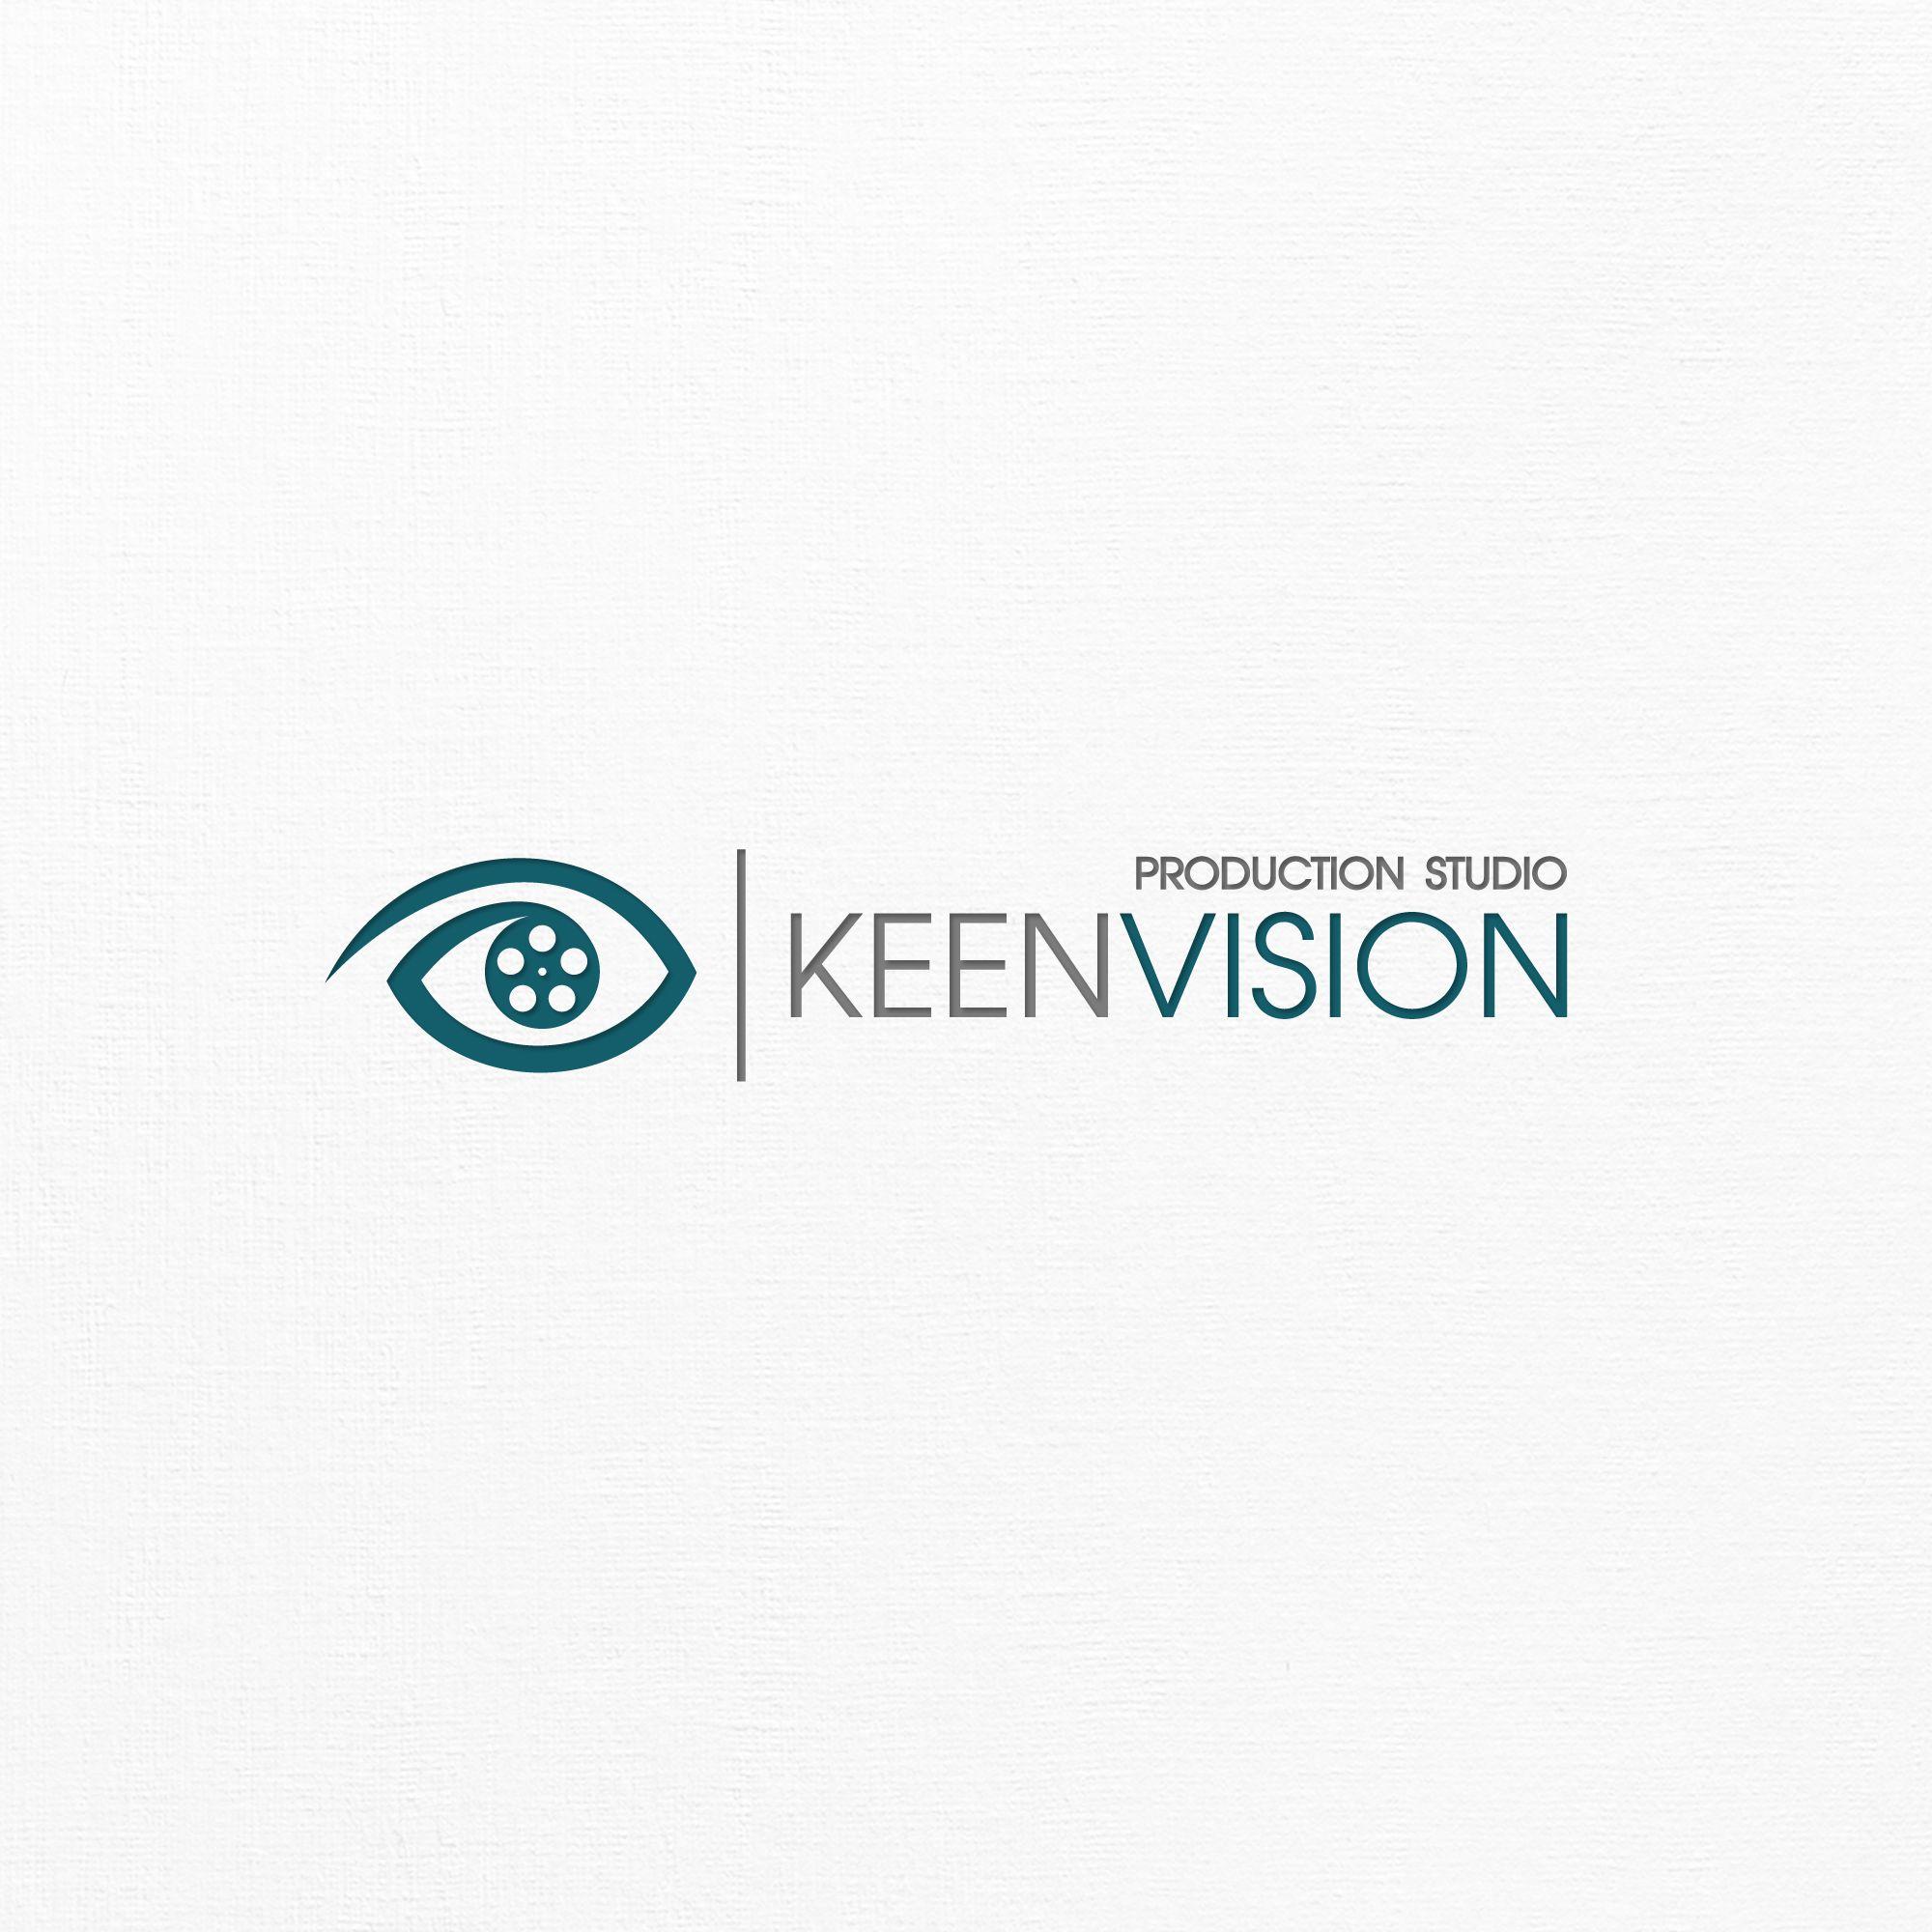 Логотип для KeenVision - дизайнер Rusj